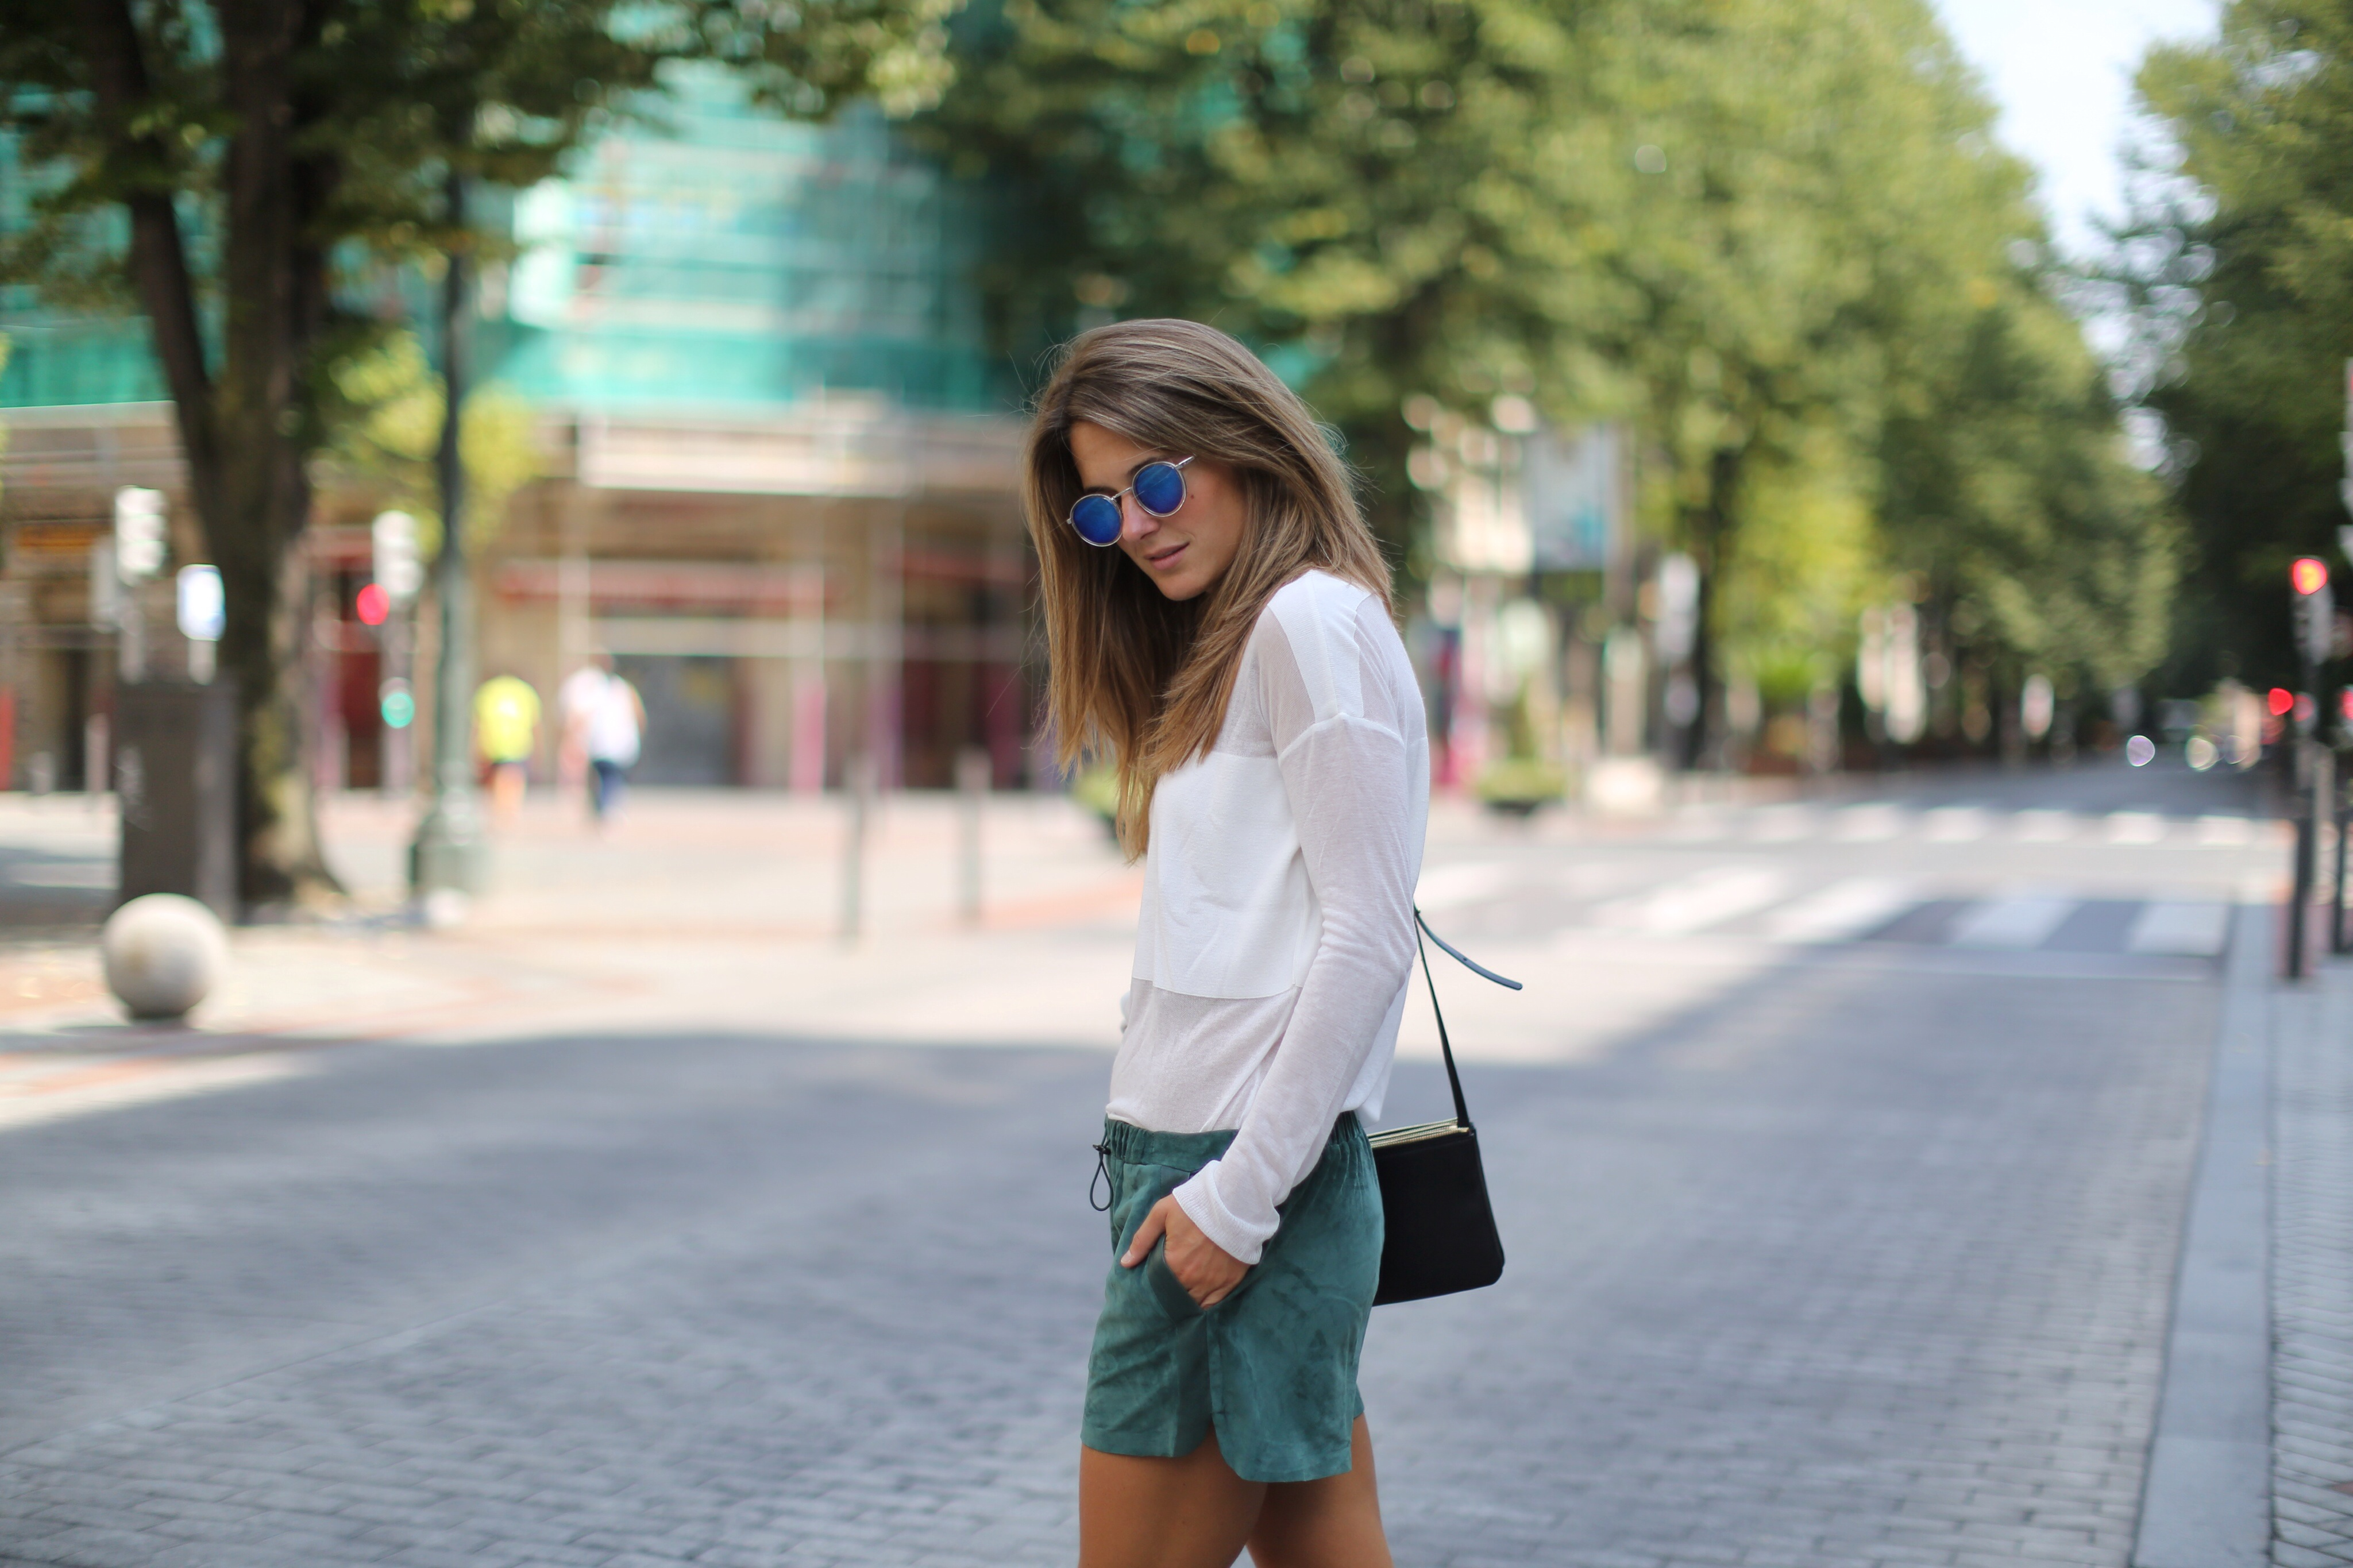 Clochet_h&m_trend_suede_shorts_converse_celine_trio_bag_06